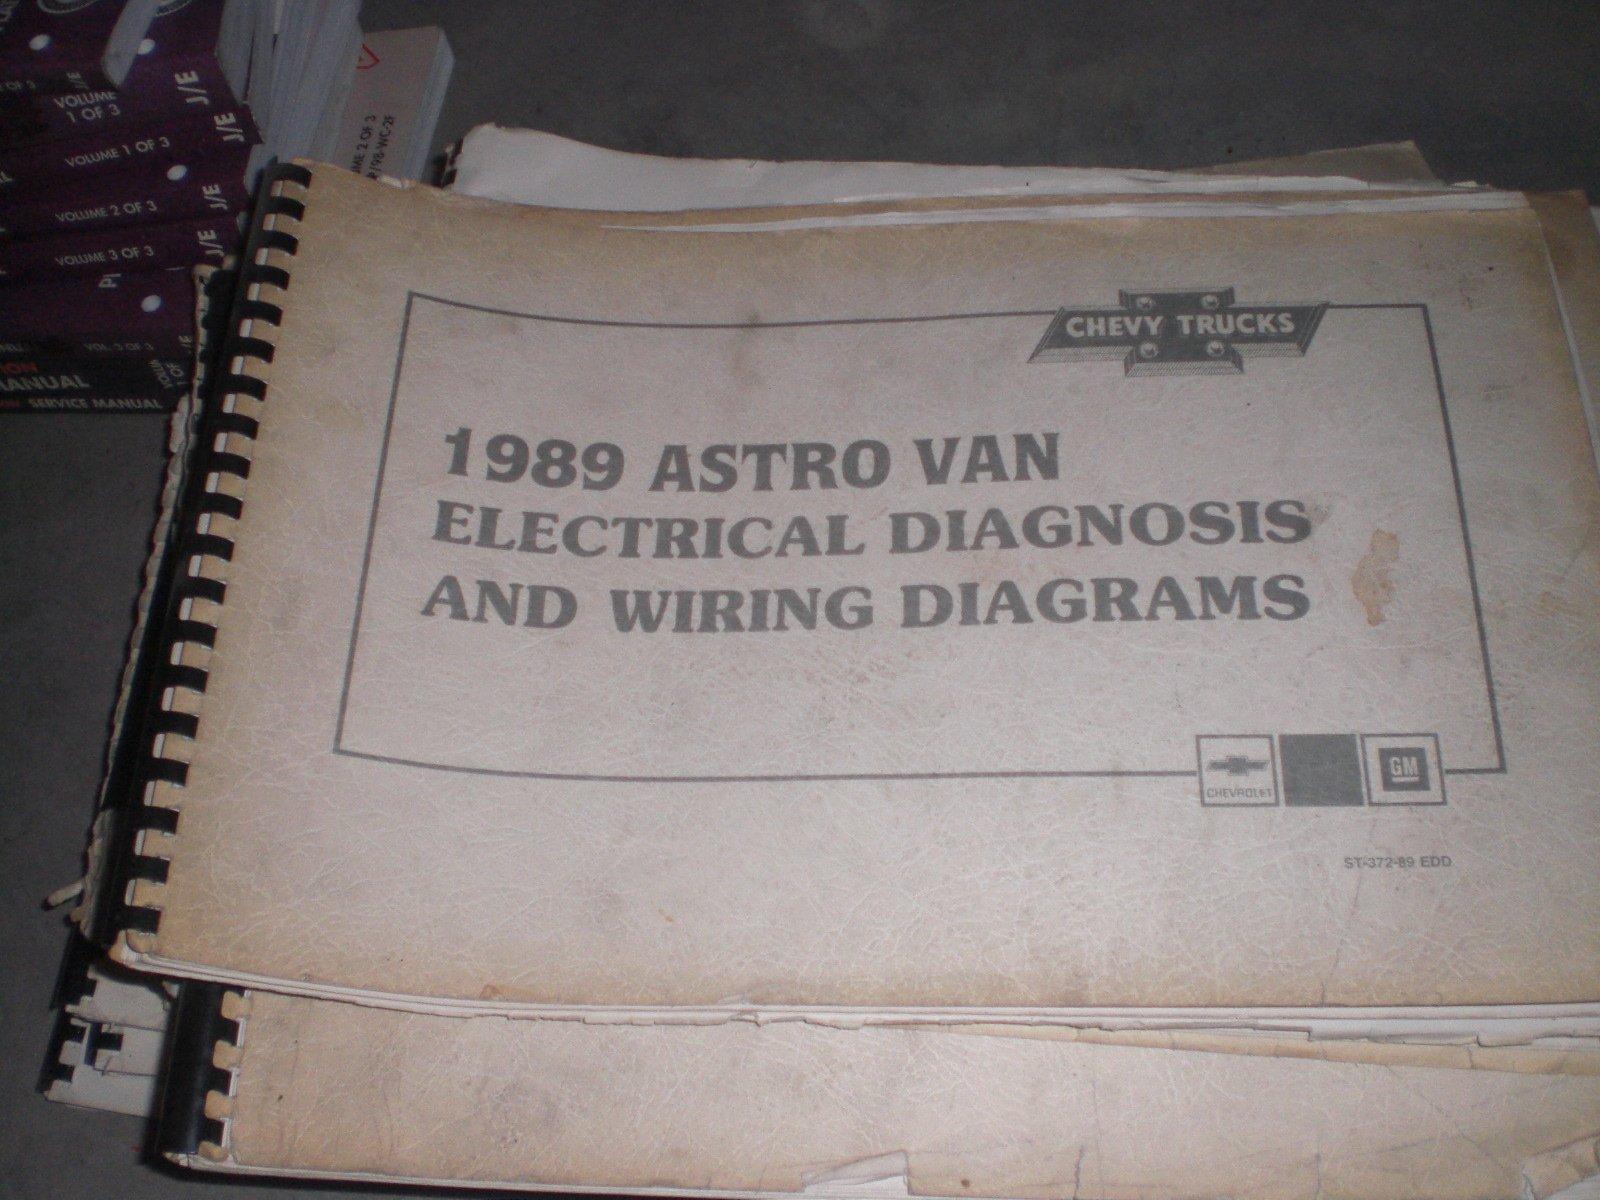 1989 chevy van wiring diagram 1989 chevrolet trucks astro van   electrical diagnosis and wiring  1989 chevrolet trucks astro van